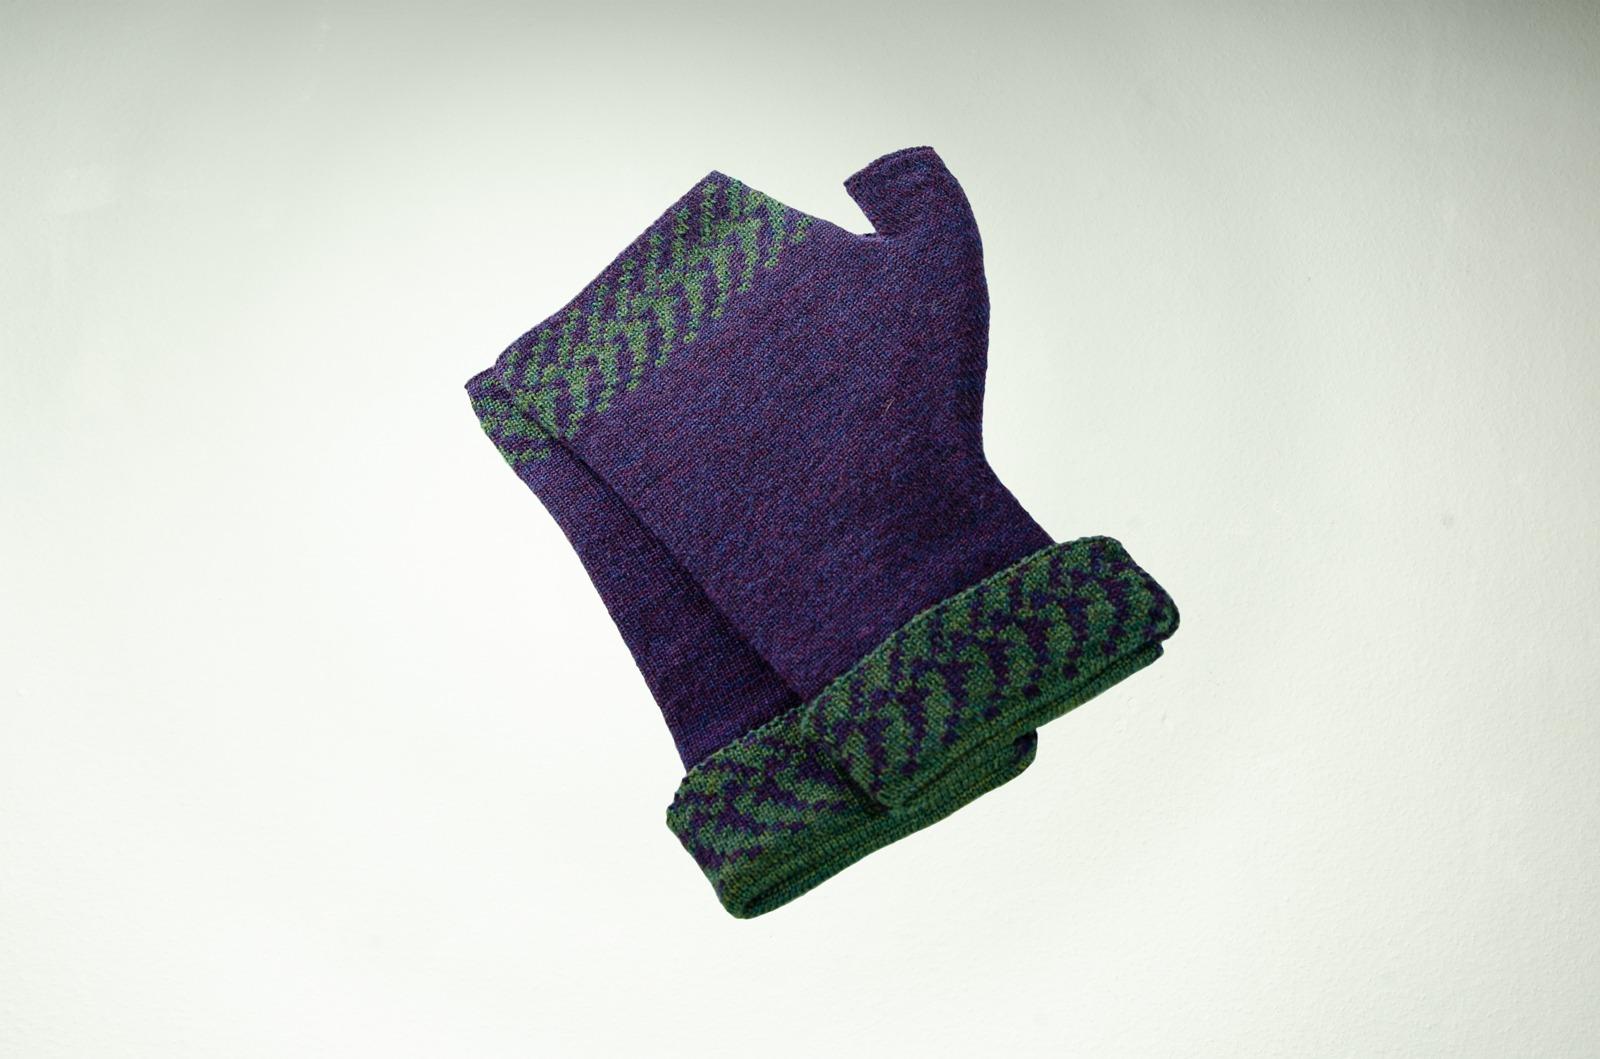 Merino Pulswärmer Pixel in lila und